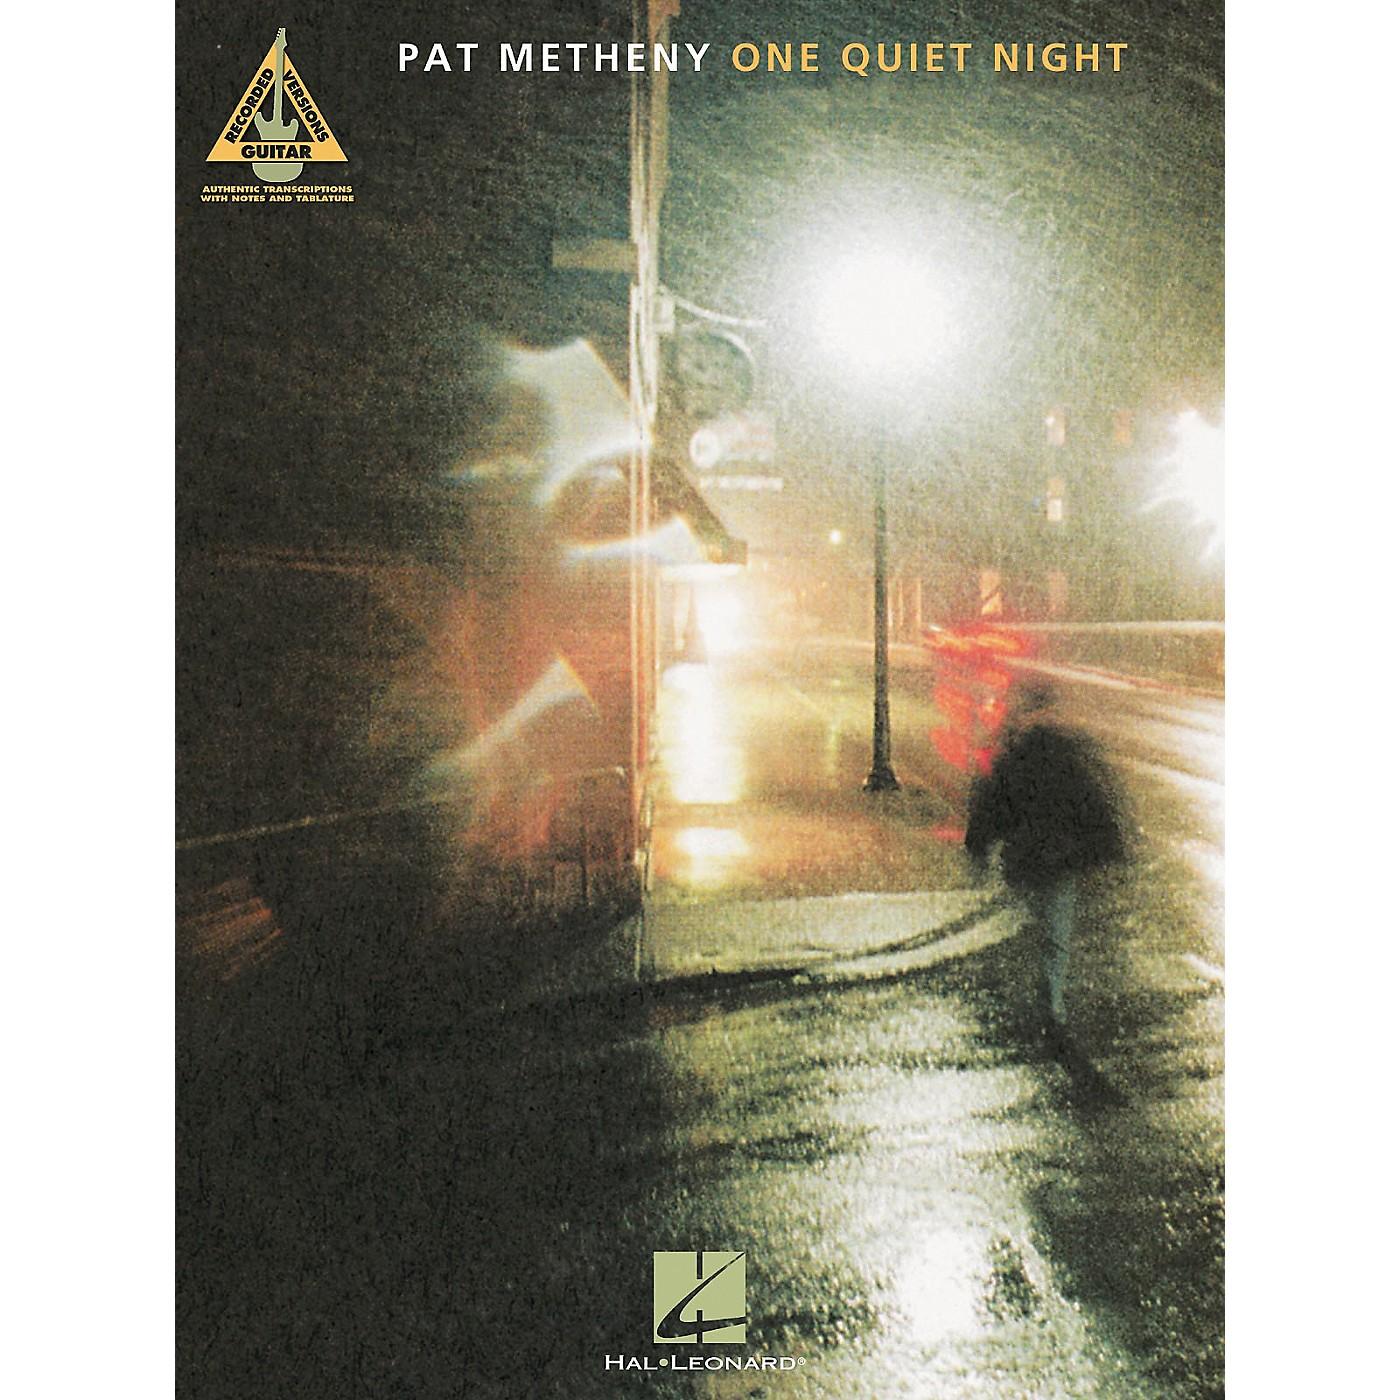 Hal Leonard Pat Metheny One Quiet Night Guitar Tab Songbook thumbnail